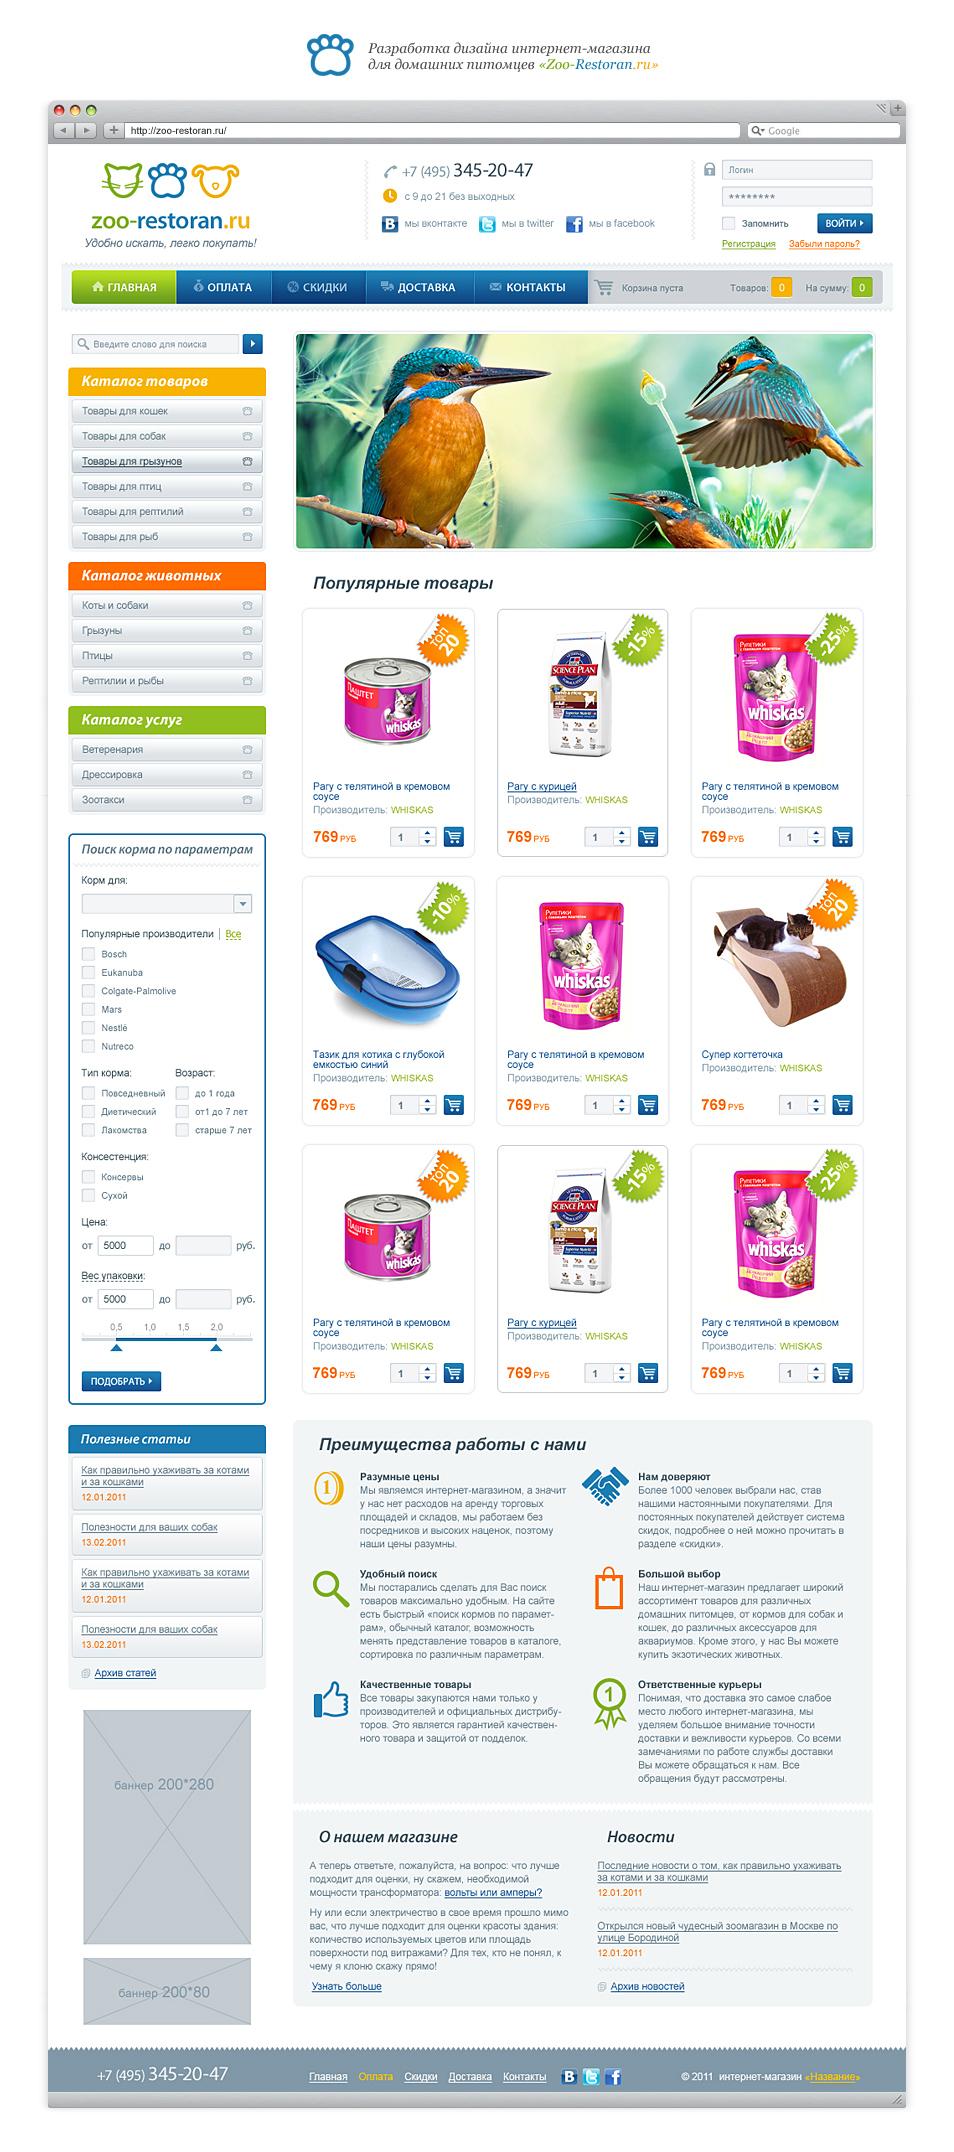 Интернет-магазин Zoo-restoran.ru